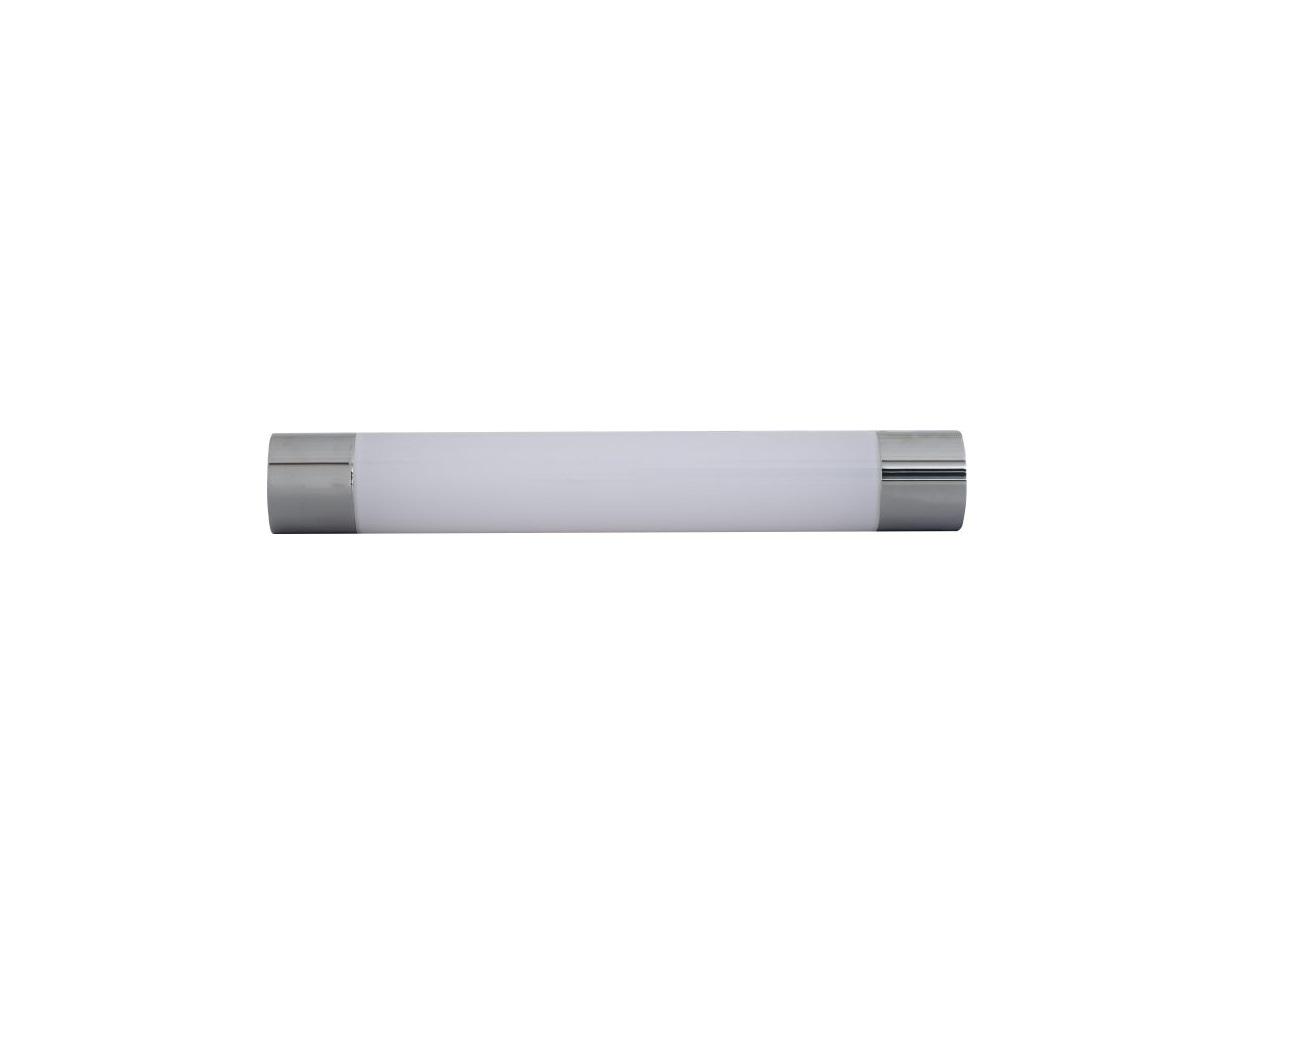 Nordesign Titan 40 LED m/stikkontakt, krom